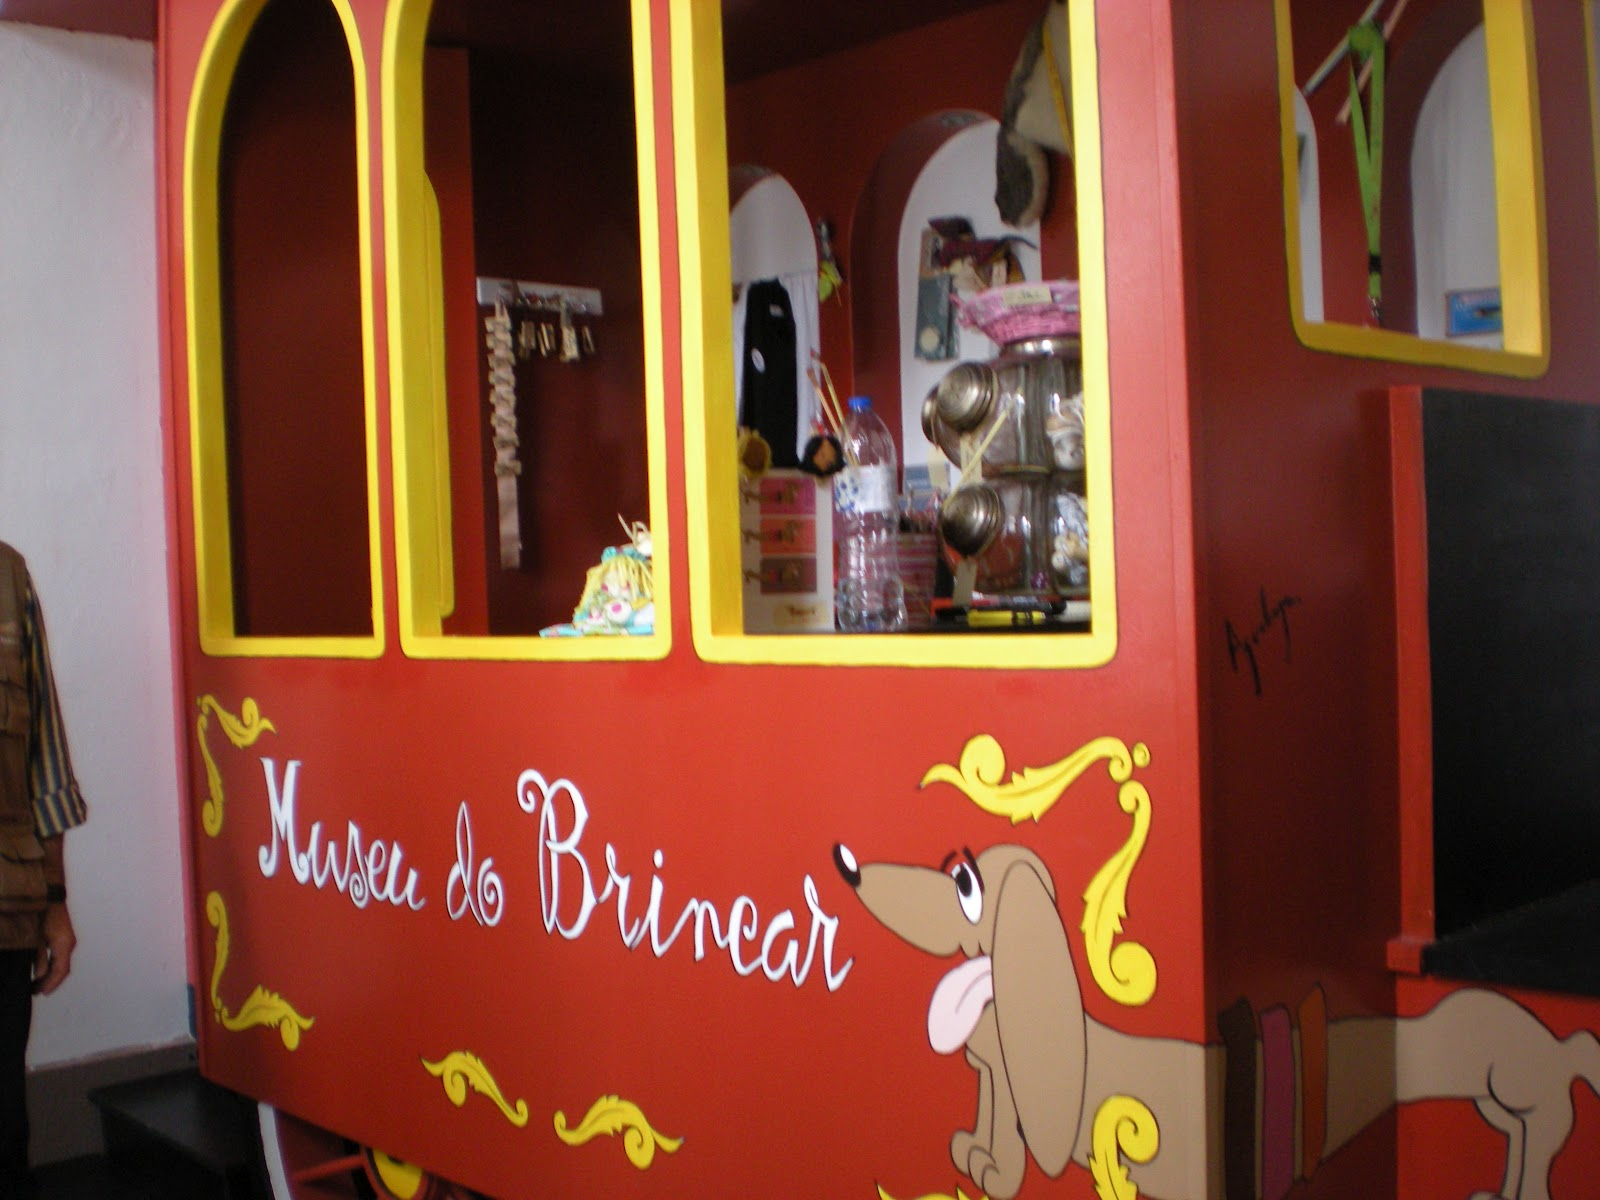 museu do brincar vagos visitar aveiro